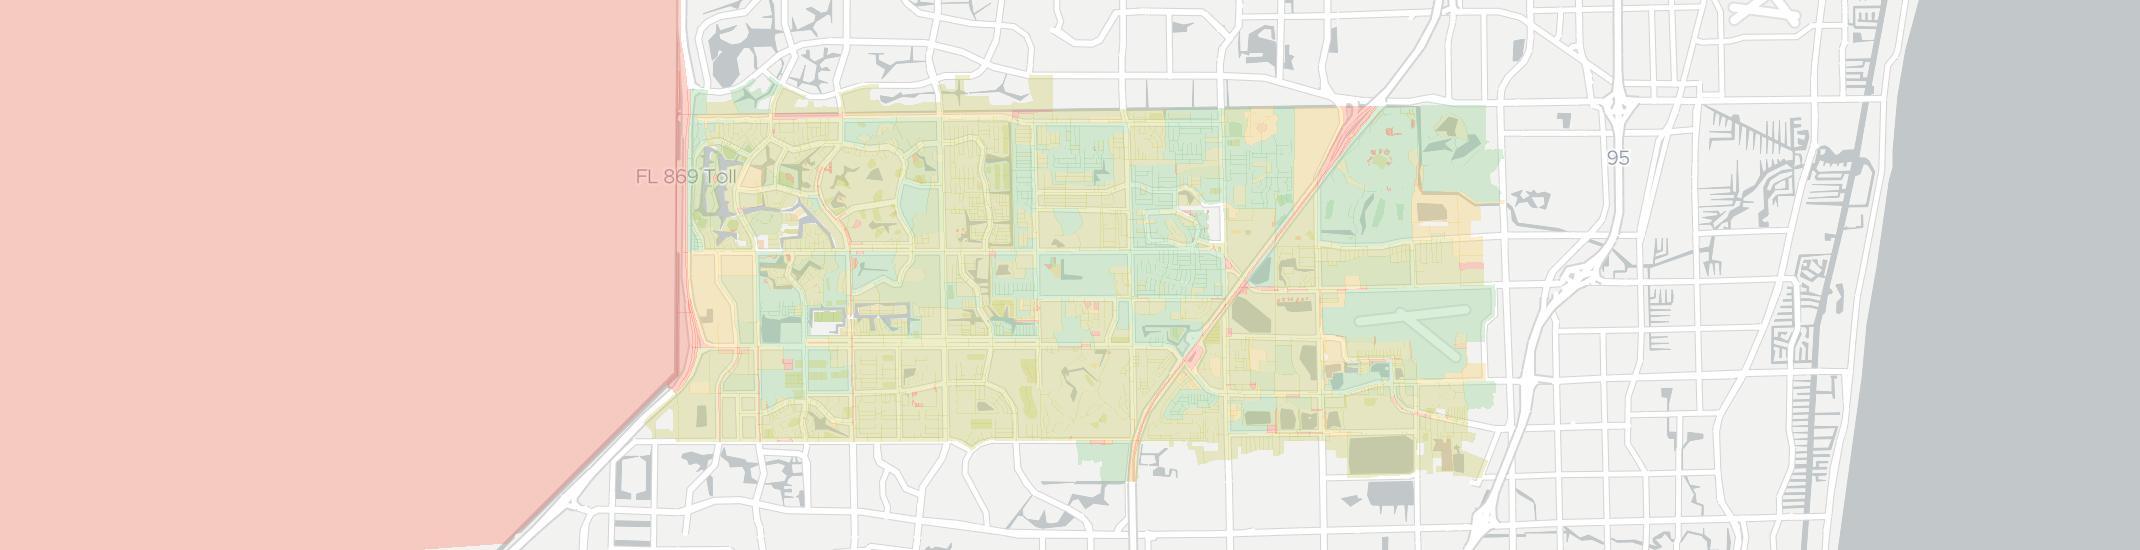 6 Best Internet Service Providers in Tamarac, FL (Aug, 2019) Zip Codes With Map Of Tamarac Fl on santa ana ca zip code map, tamarac university, irvine ca zip code map, houston tx zip code map, tamarac zoning map, anaheim ca zip code map, philadelphia pa zip code map, austin tx zip code map, broward county zip code map, panama city beach zip code map, chicago il zip code map, memphis tn zip code map, spokane wa zip code map, lauderhill fl map, phoenix az zip code map, pittsburgh pa zip code map, riverside ca zip code map, tucson az zip code map, tamarac florida map, seattle wa zip code map,